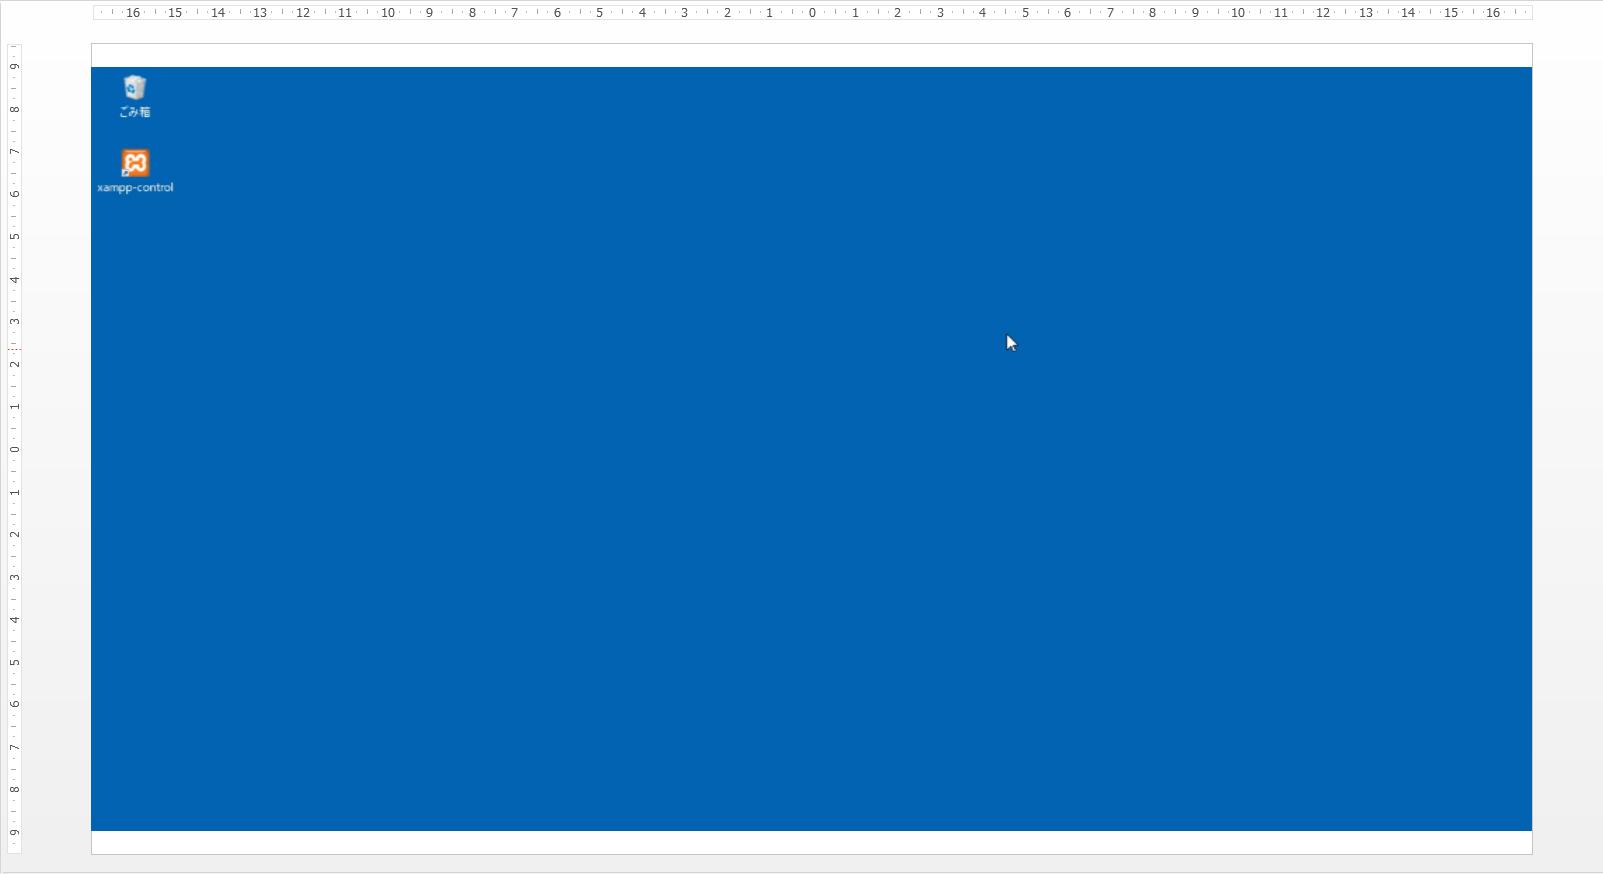 PowerPointでデスクトップ録画